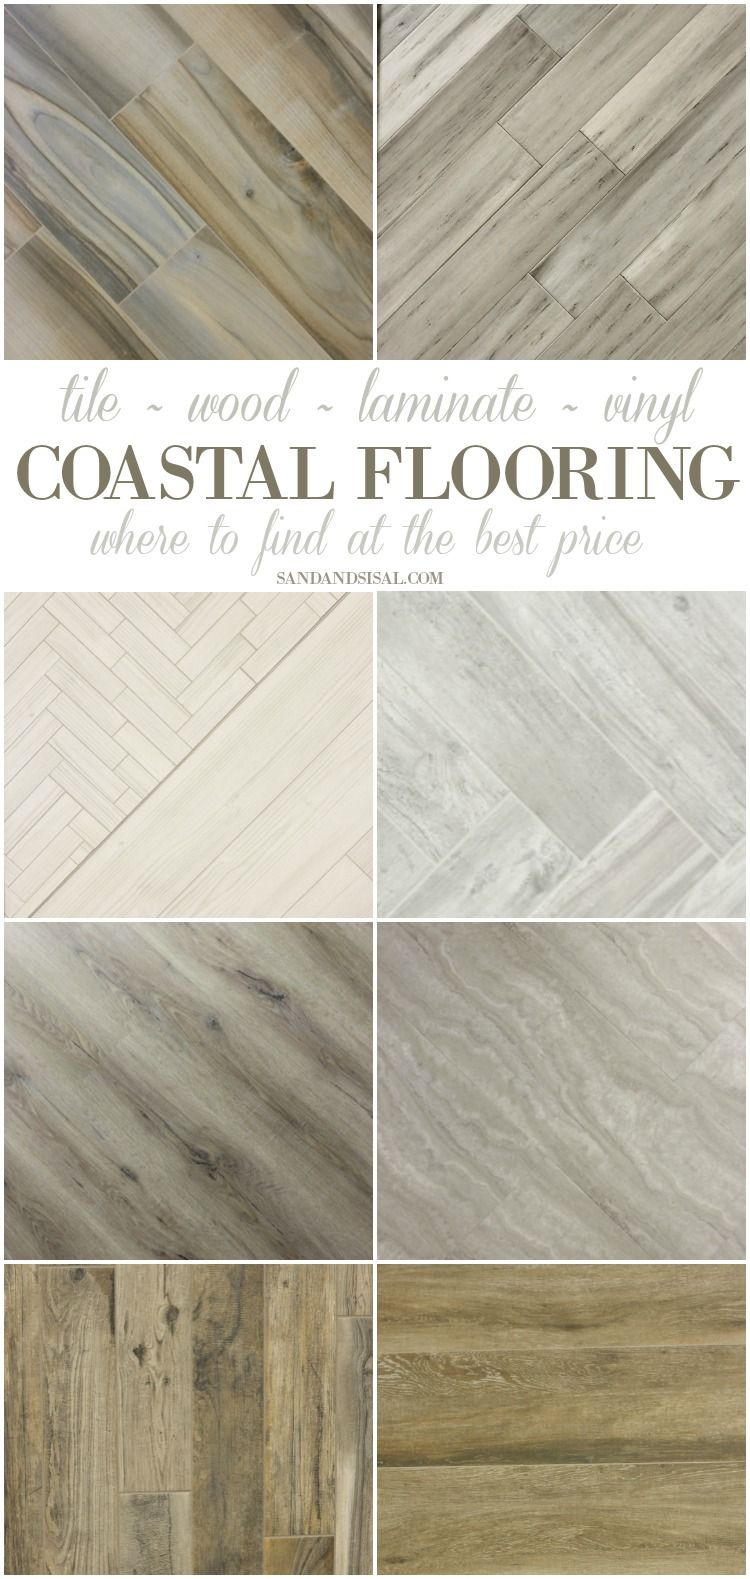 Floor decor an amazing store tour luxury vinyl for Beach house flooring ideas